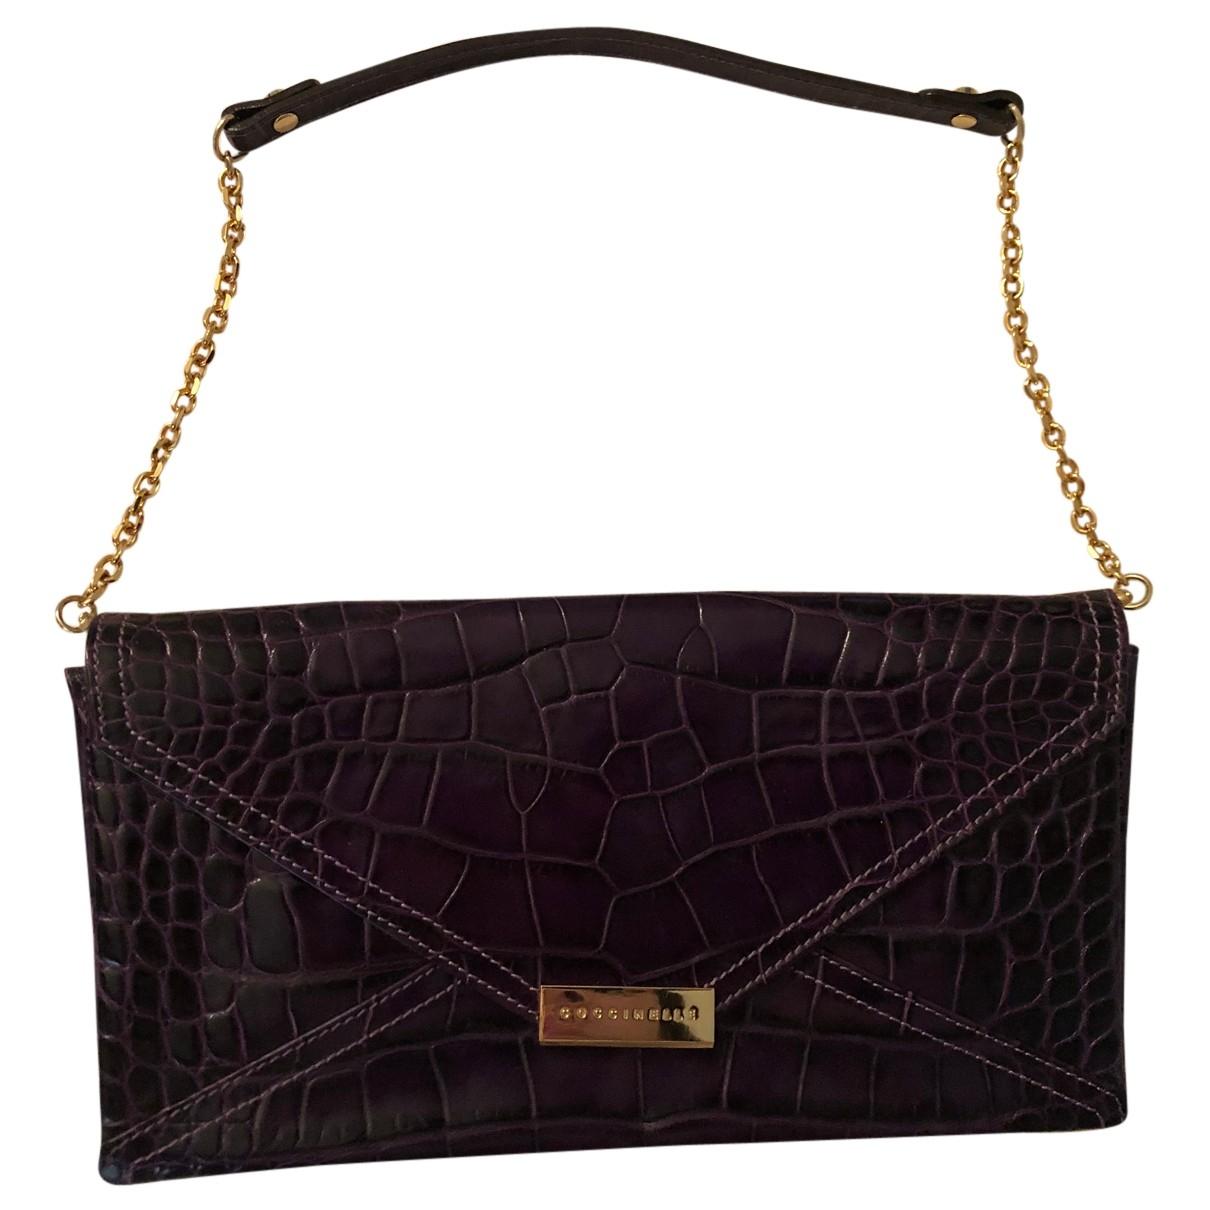 Coccinelle \N Purple Clutch bag for Women \N